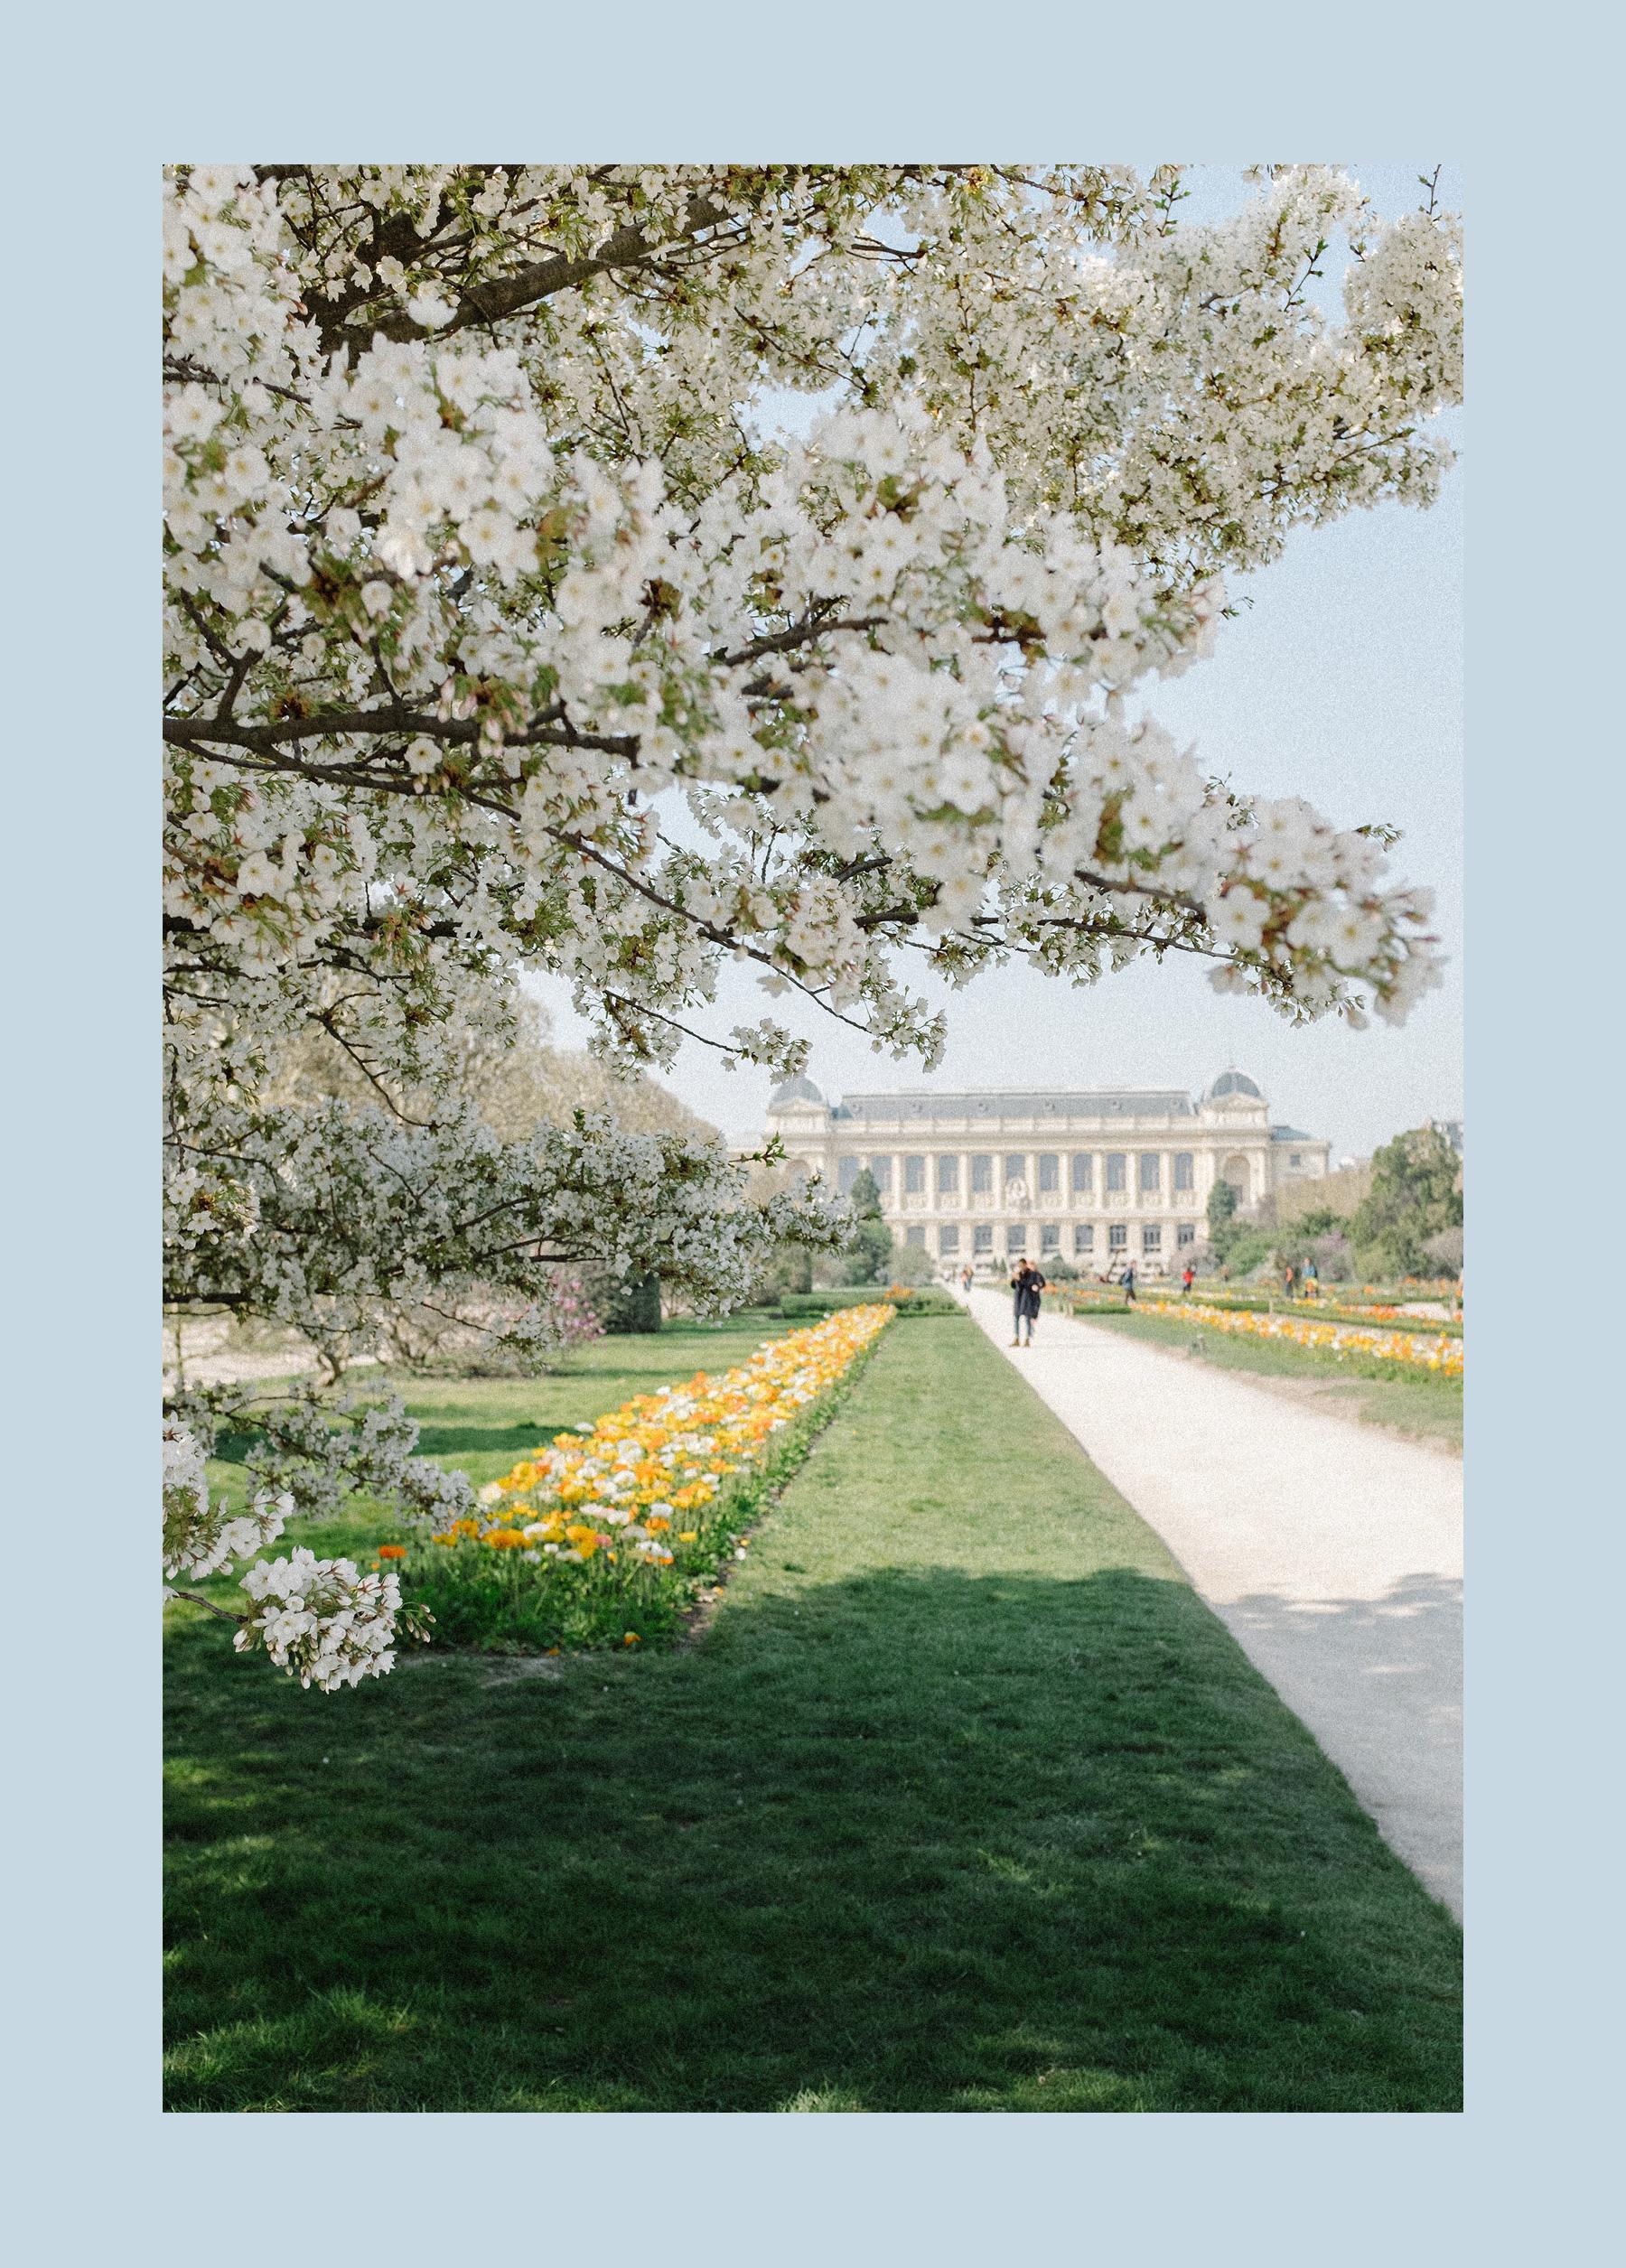 Paris_Spring_CarinOlsson_02.jpg